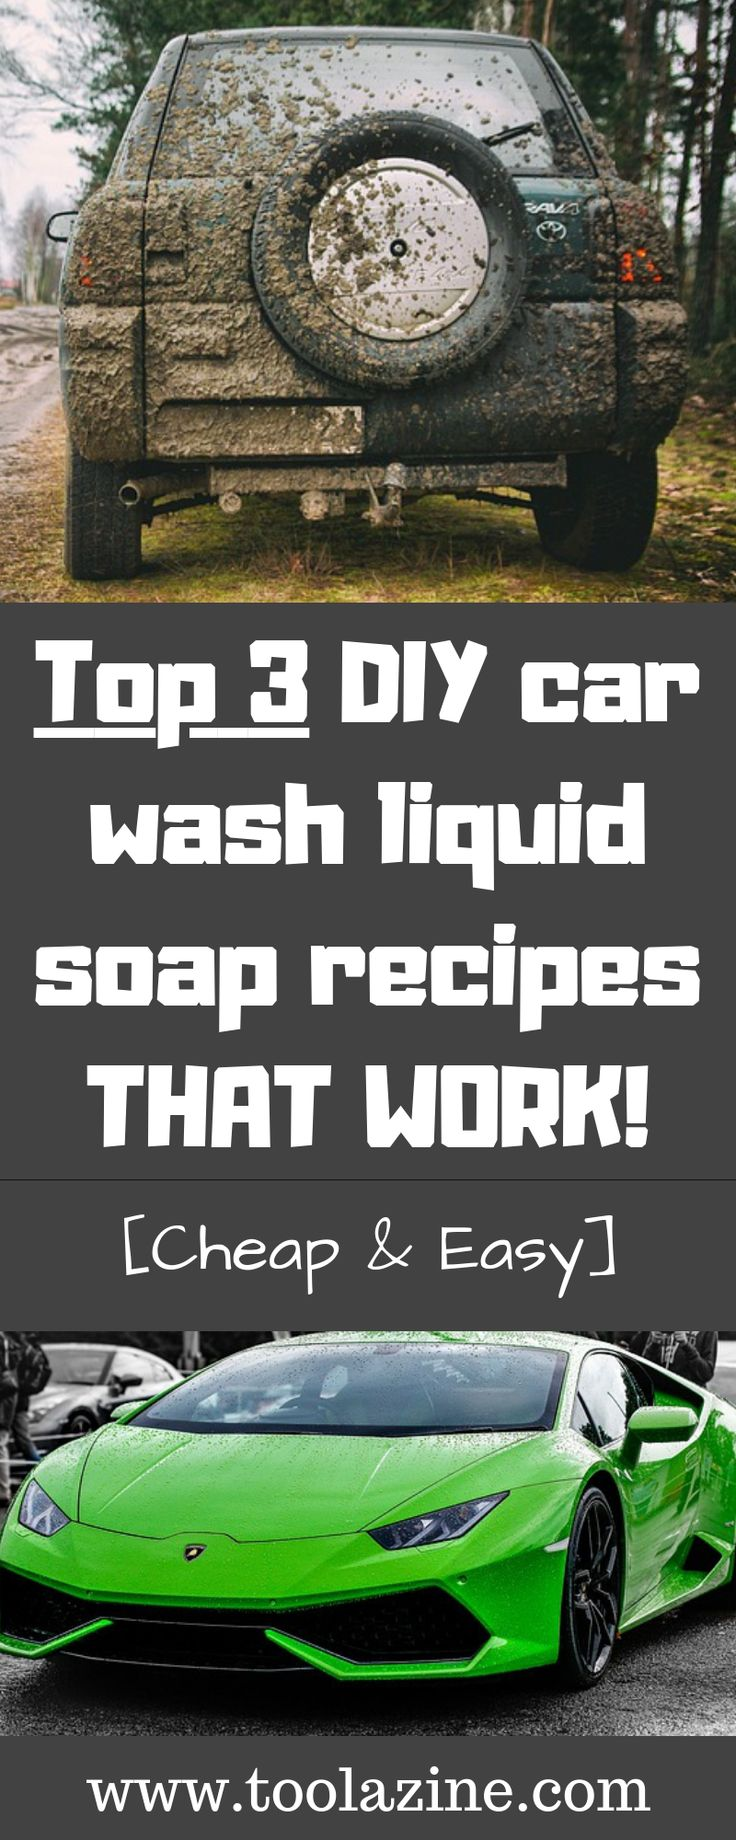 Top 3 DIY car wash liquid soap recipes THAT WORK [Cheap